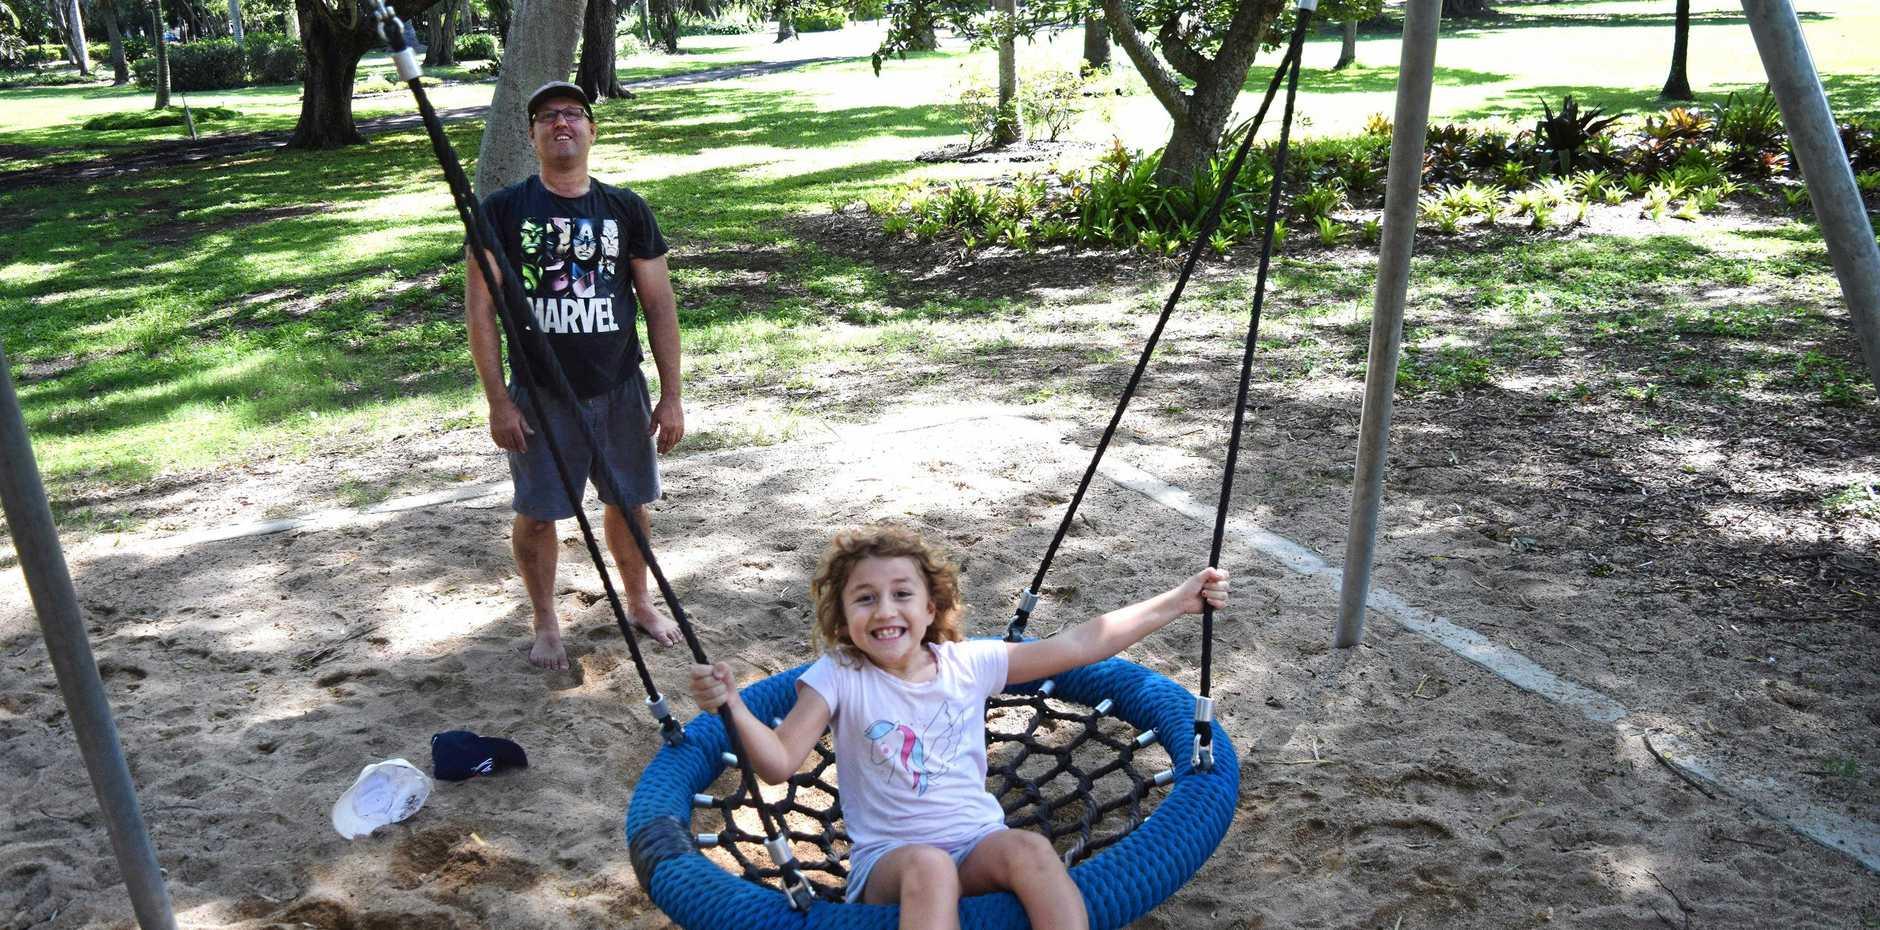 POPULAR SPOT: Tahnee Gregurke, 7, swings at Queens Park with the help of her father Simon Gregurke.